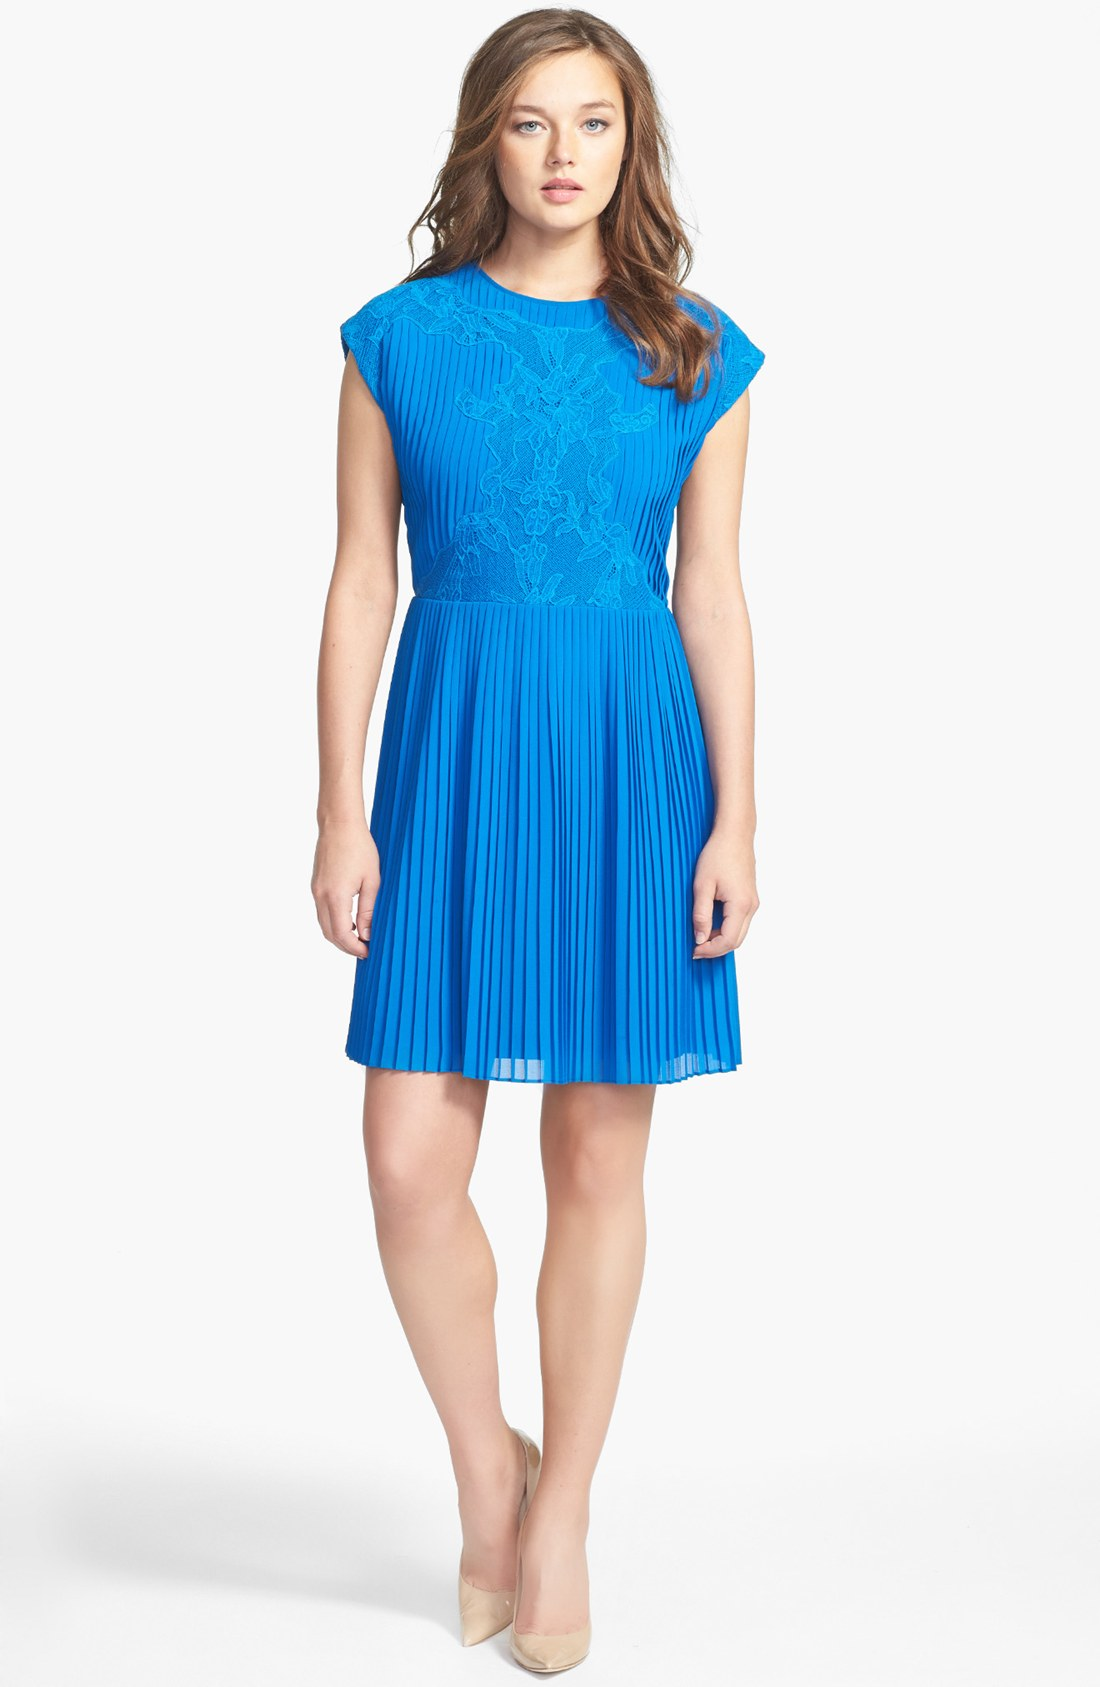 Ted Baker London NEW Saskiah blue Lace Pleated Sleeveless Dress size 1 US 4